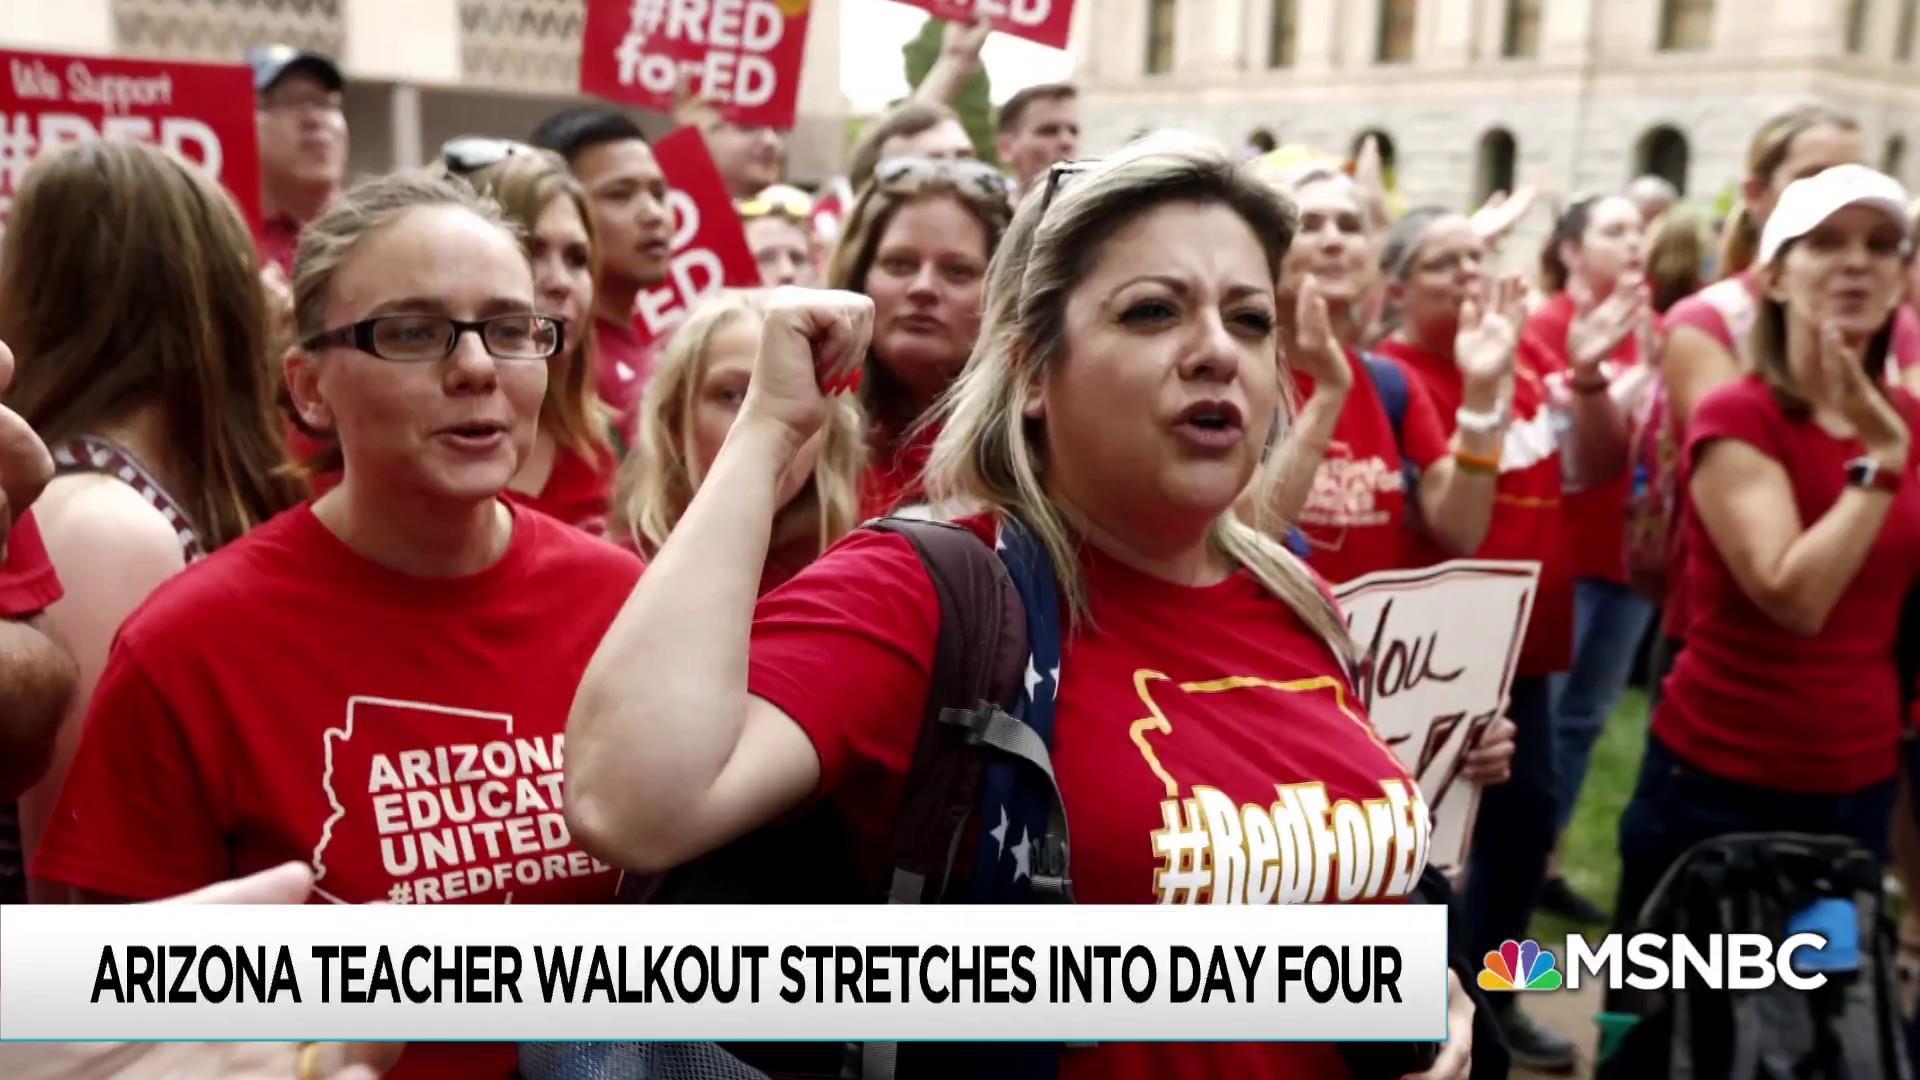 Arizona teachers seeking better pay walk out for fourth day